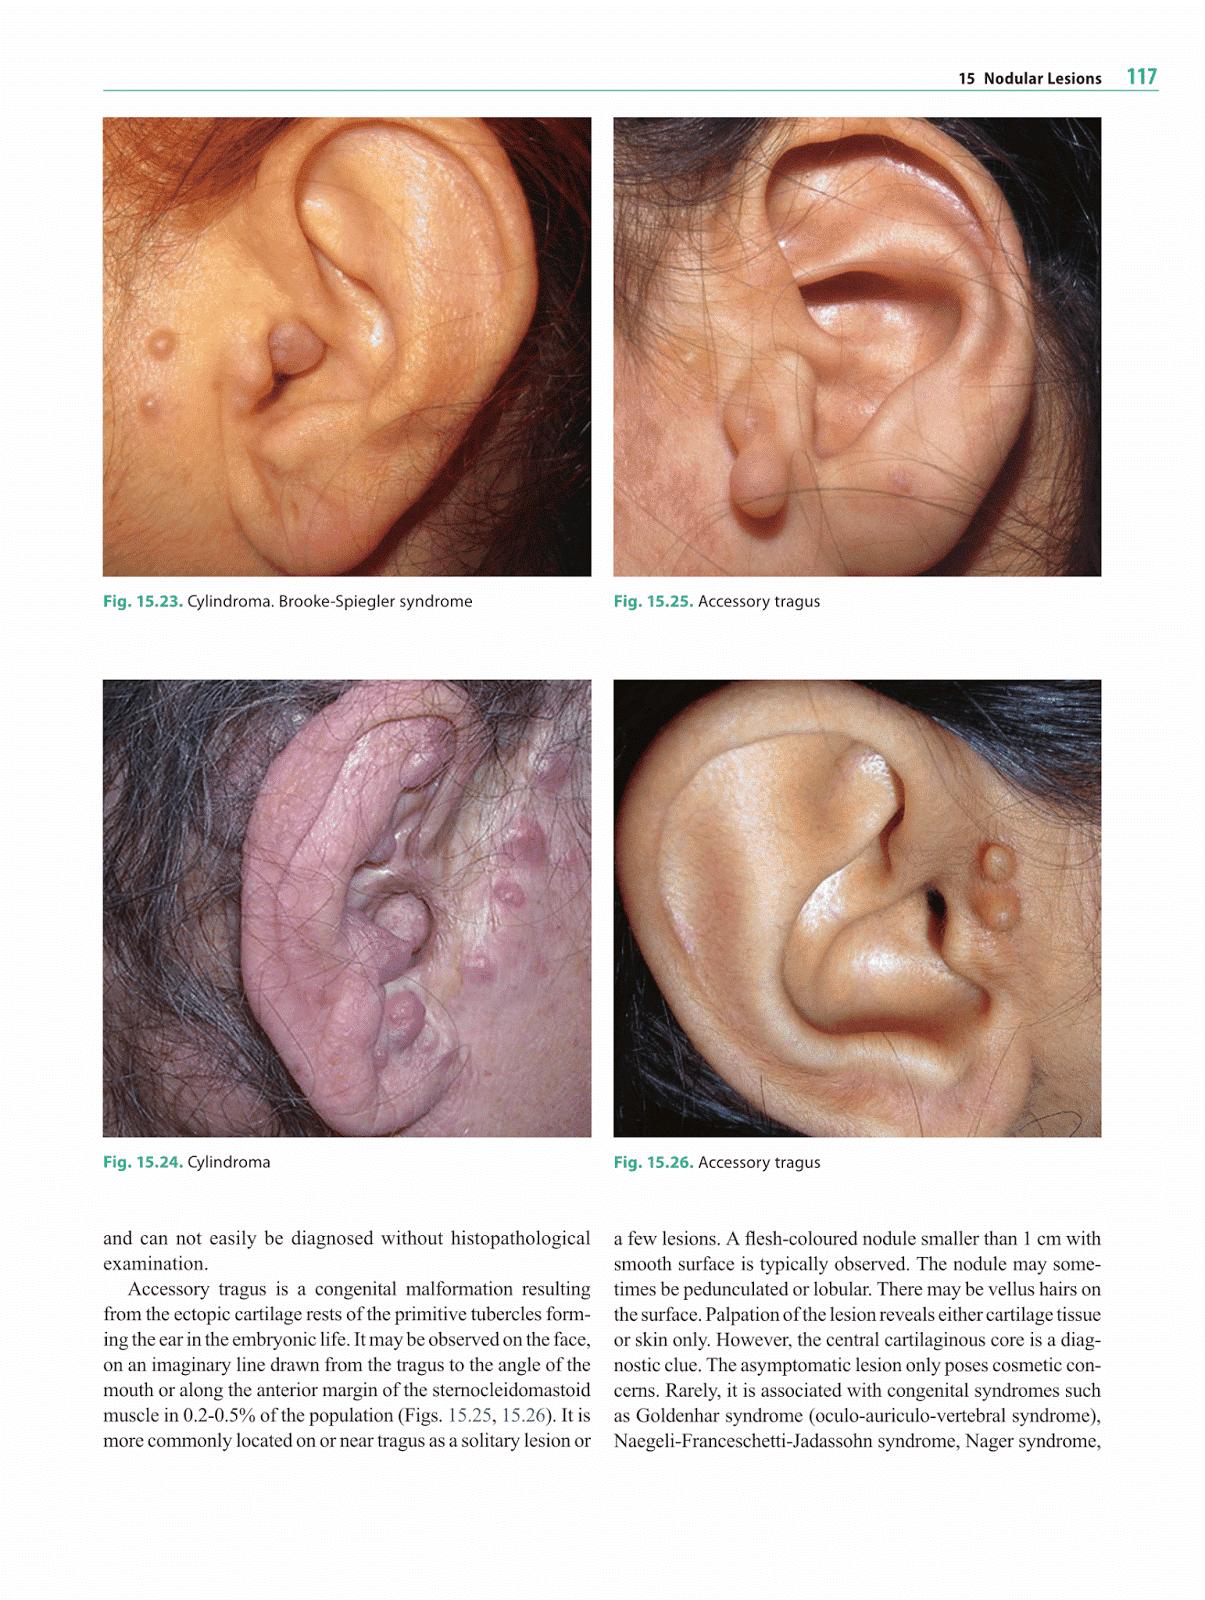 Otolaryngology by Alexandros G Sfakianakis: Nodular Lesions